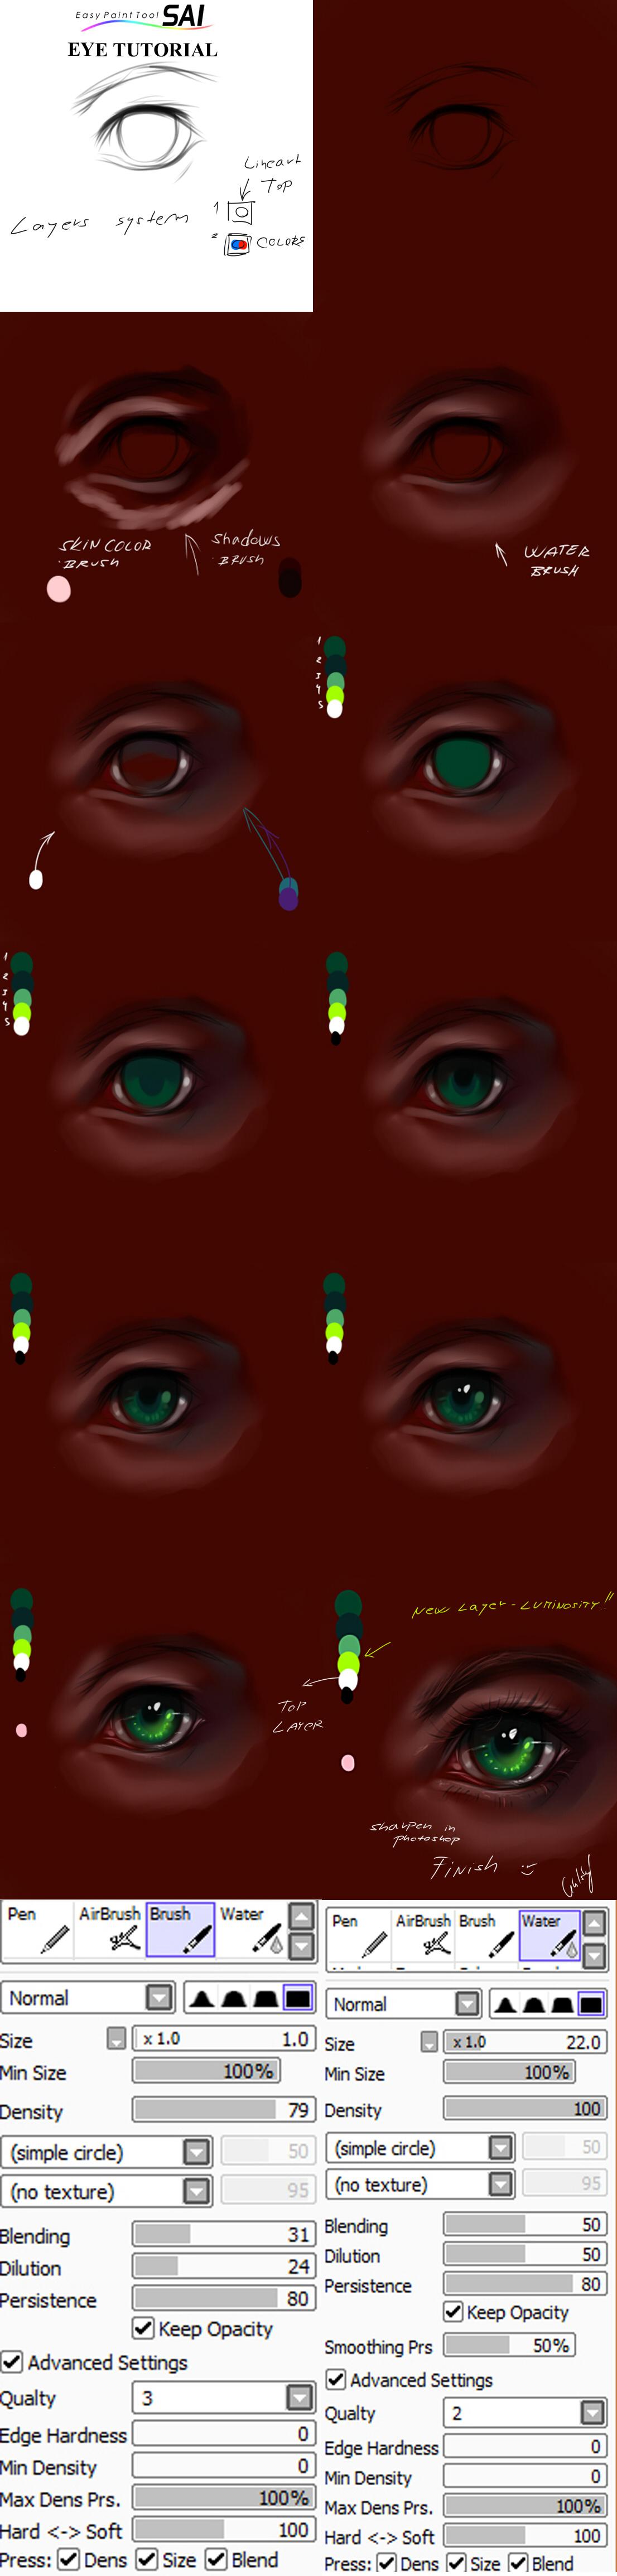 Paint tool SAI eyes tutorial